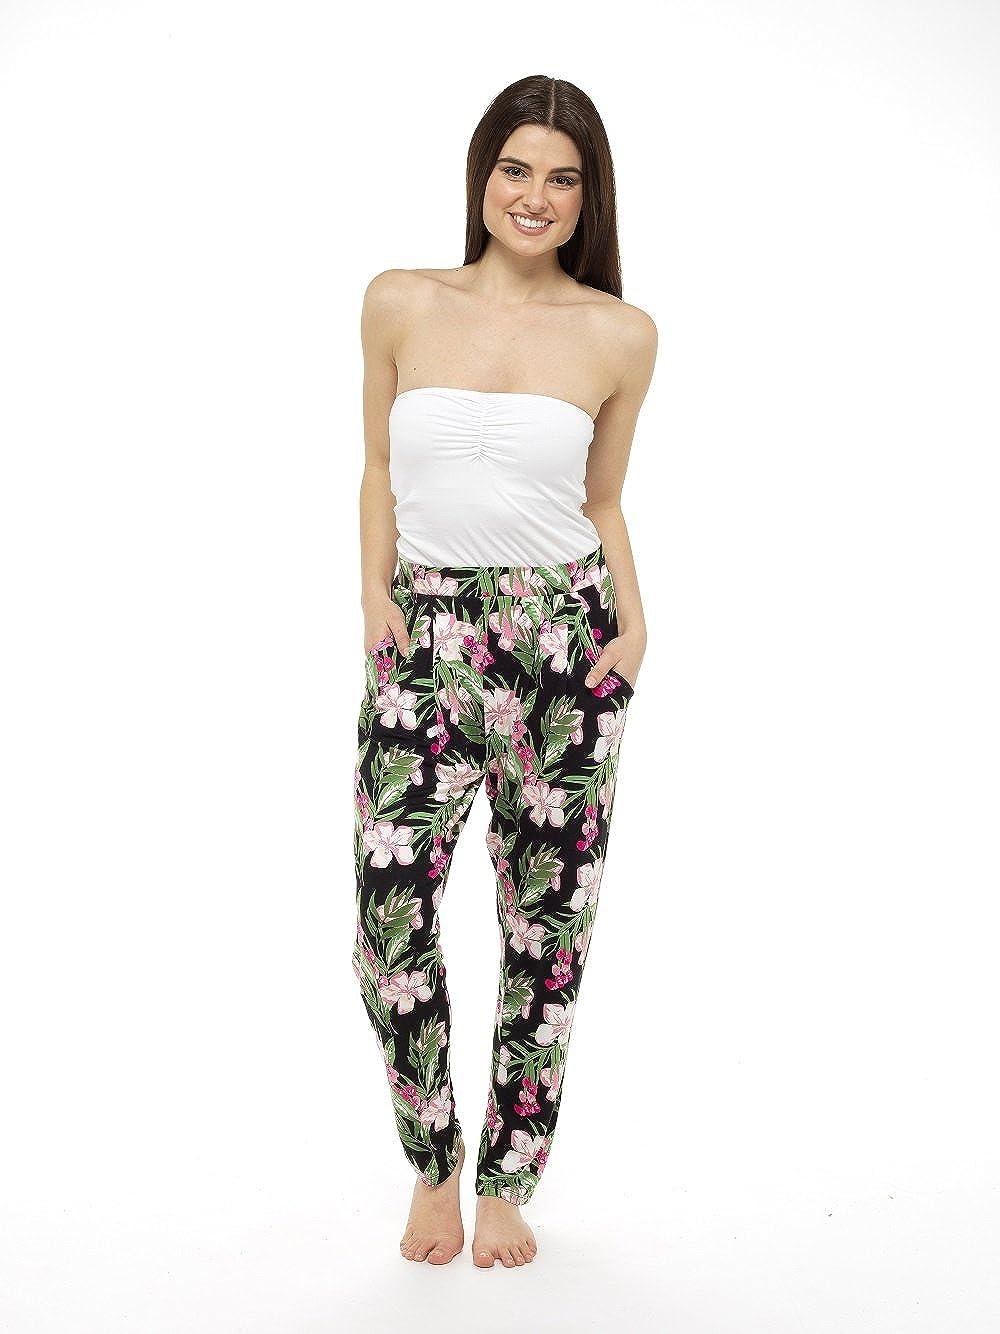 Harem Pants for Women Bohemian Clothing Ali Baba Aladdin Cuffed Trousers Yoga Womens Lightweight Pantaloons